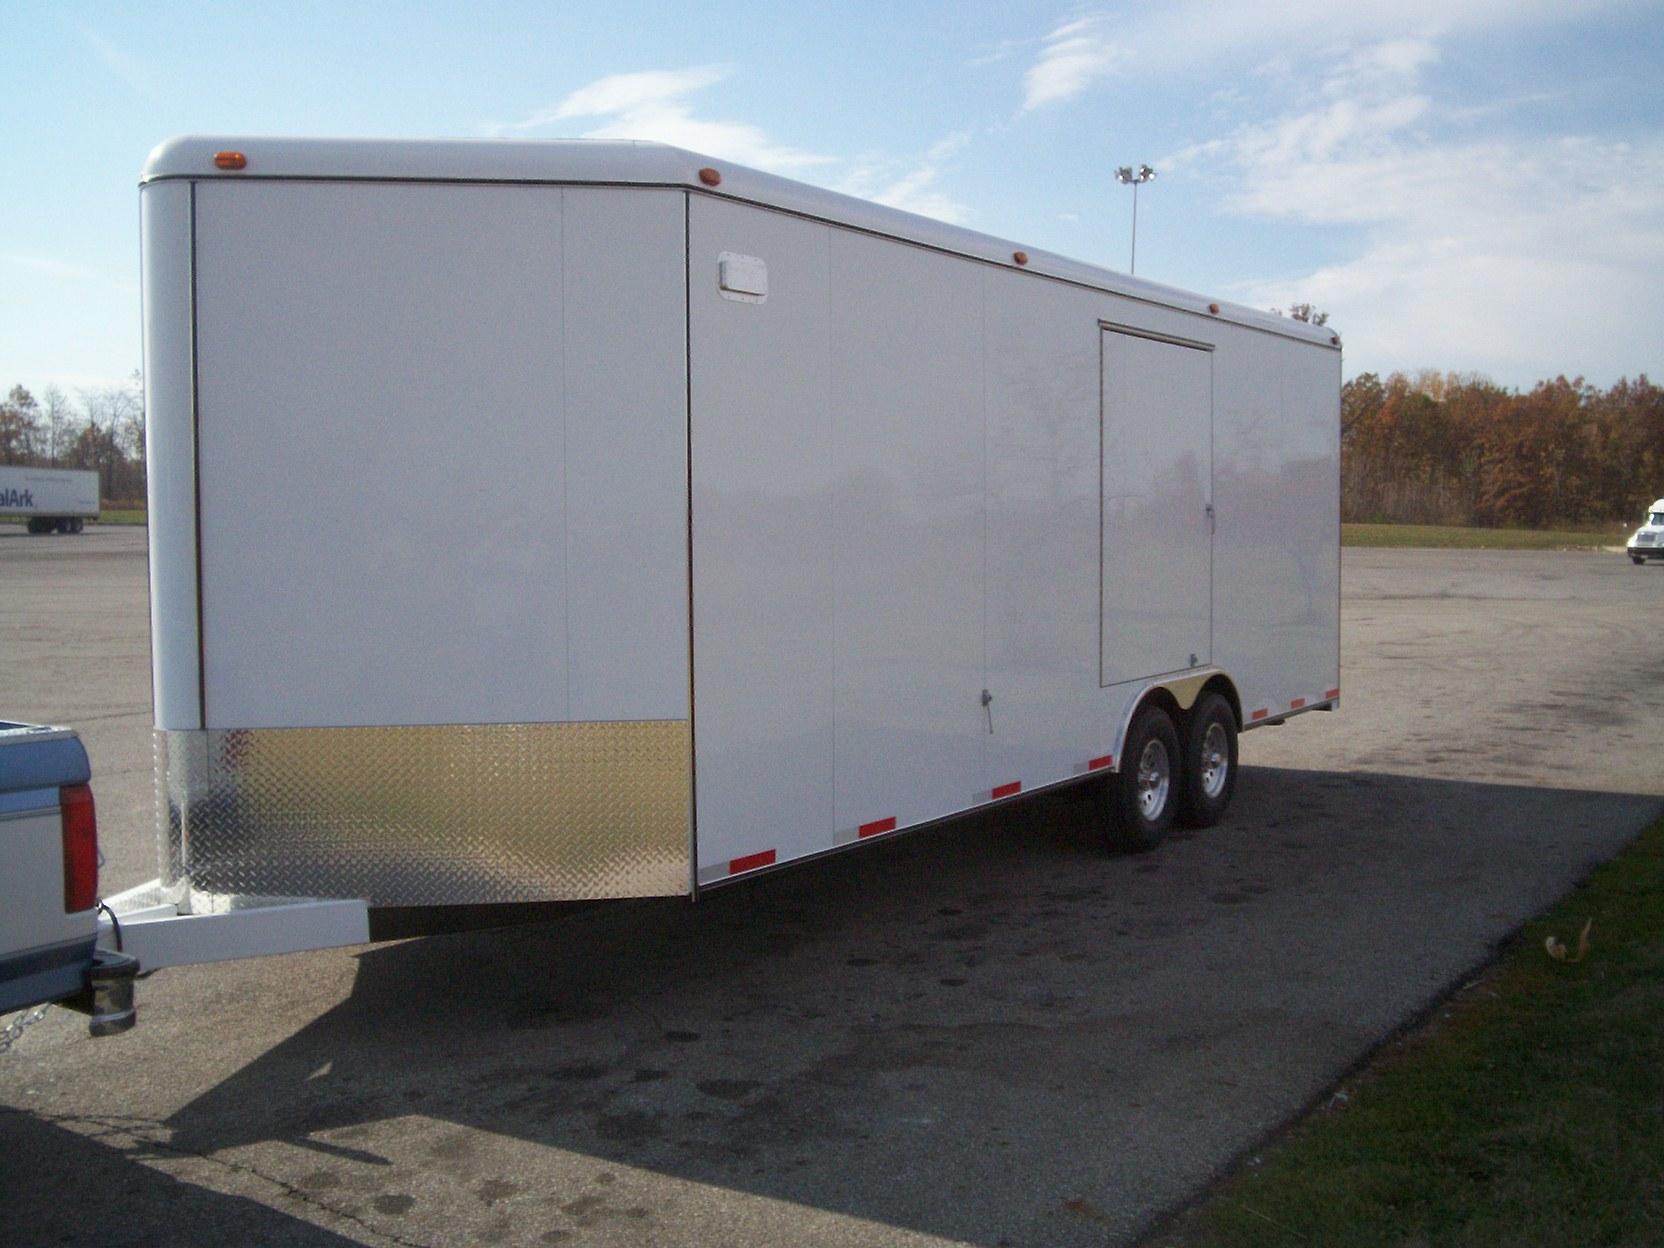 Enclosed Car Trailers Triple B. Enclosed Car Trailers. Wiring. Livestock Trailer Cargo Light Wiring Diagram At Scoala.co